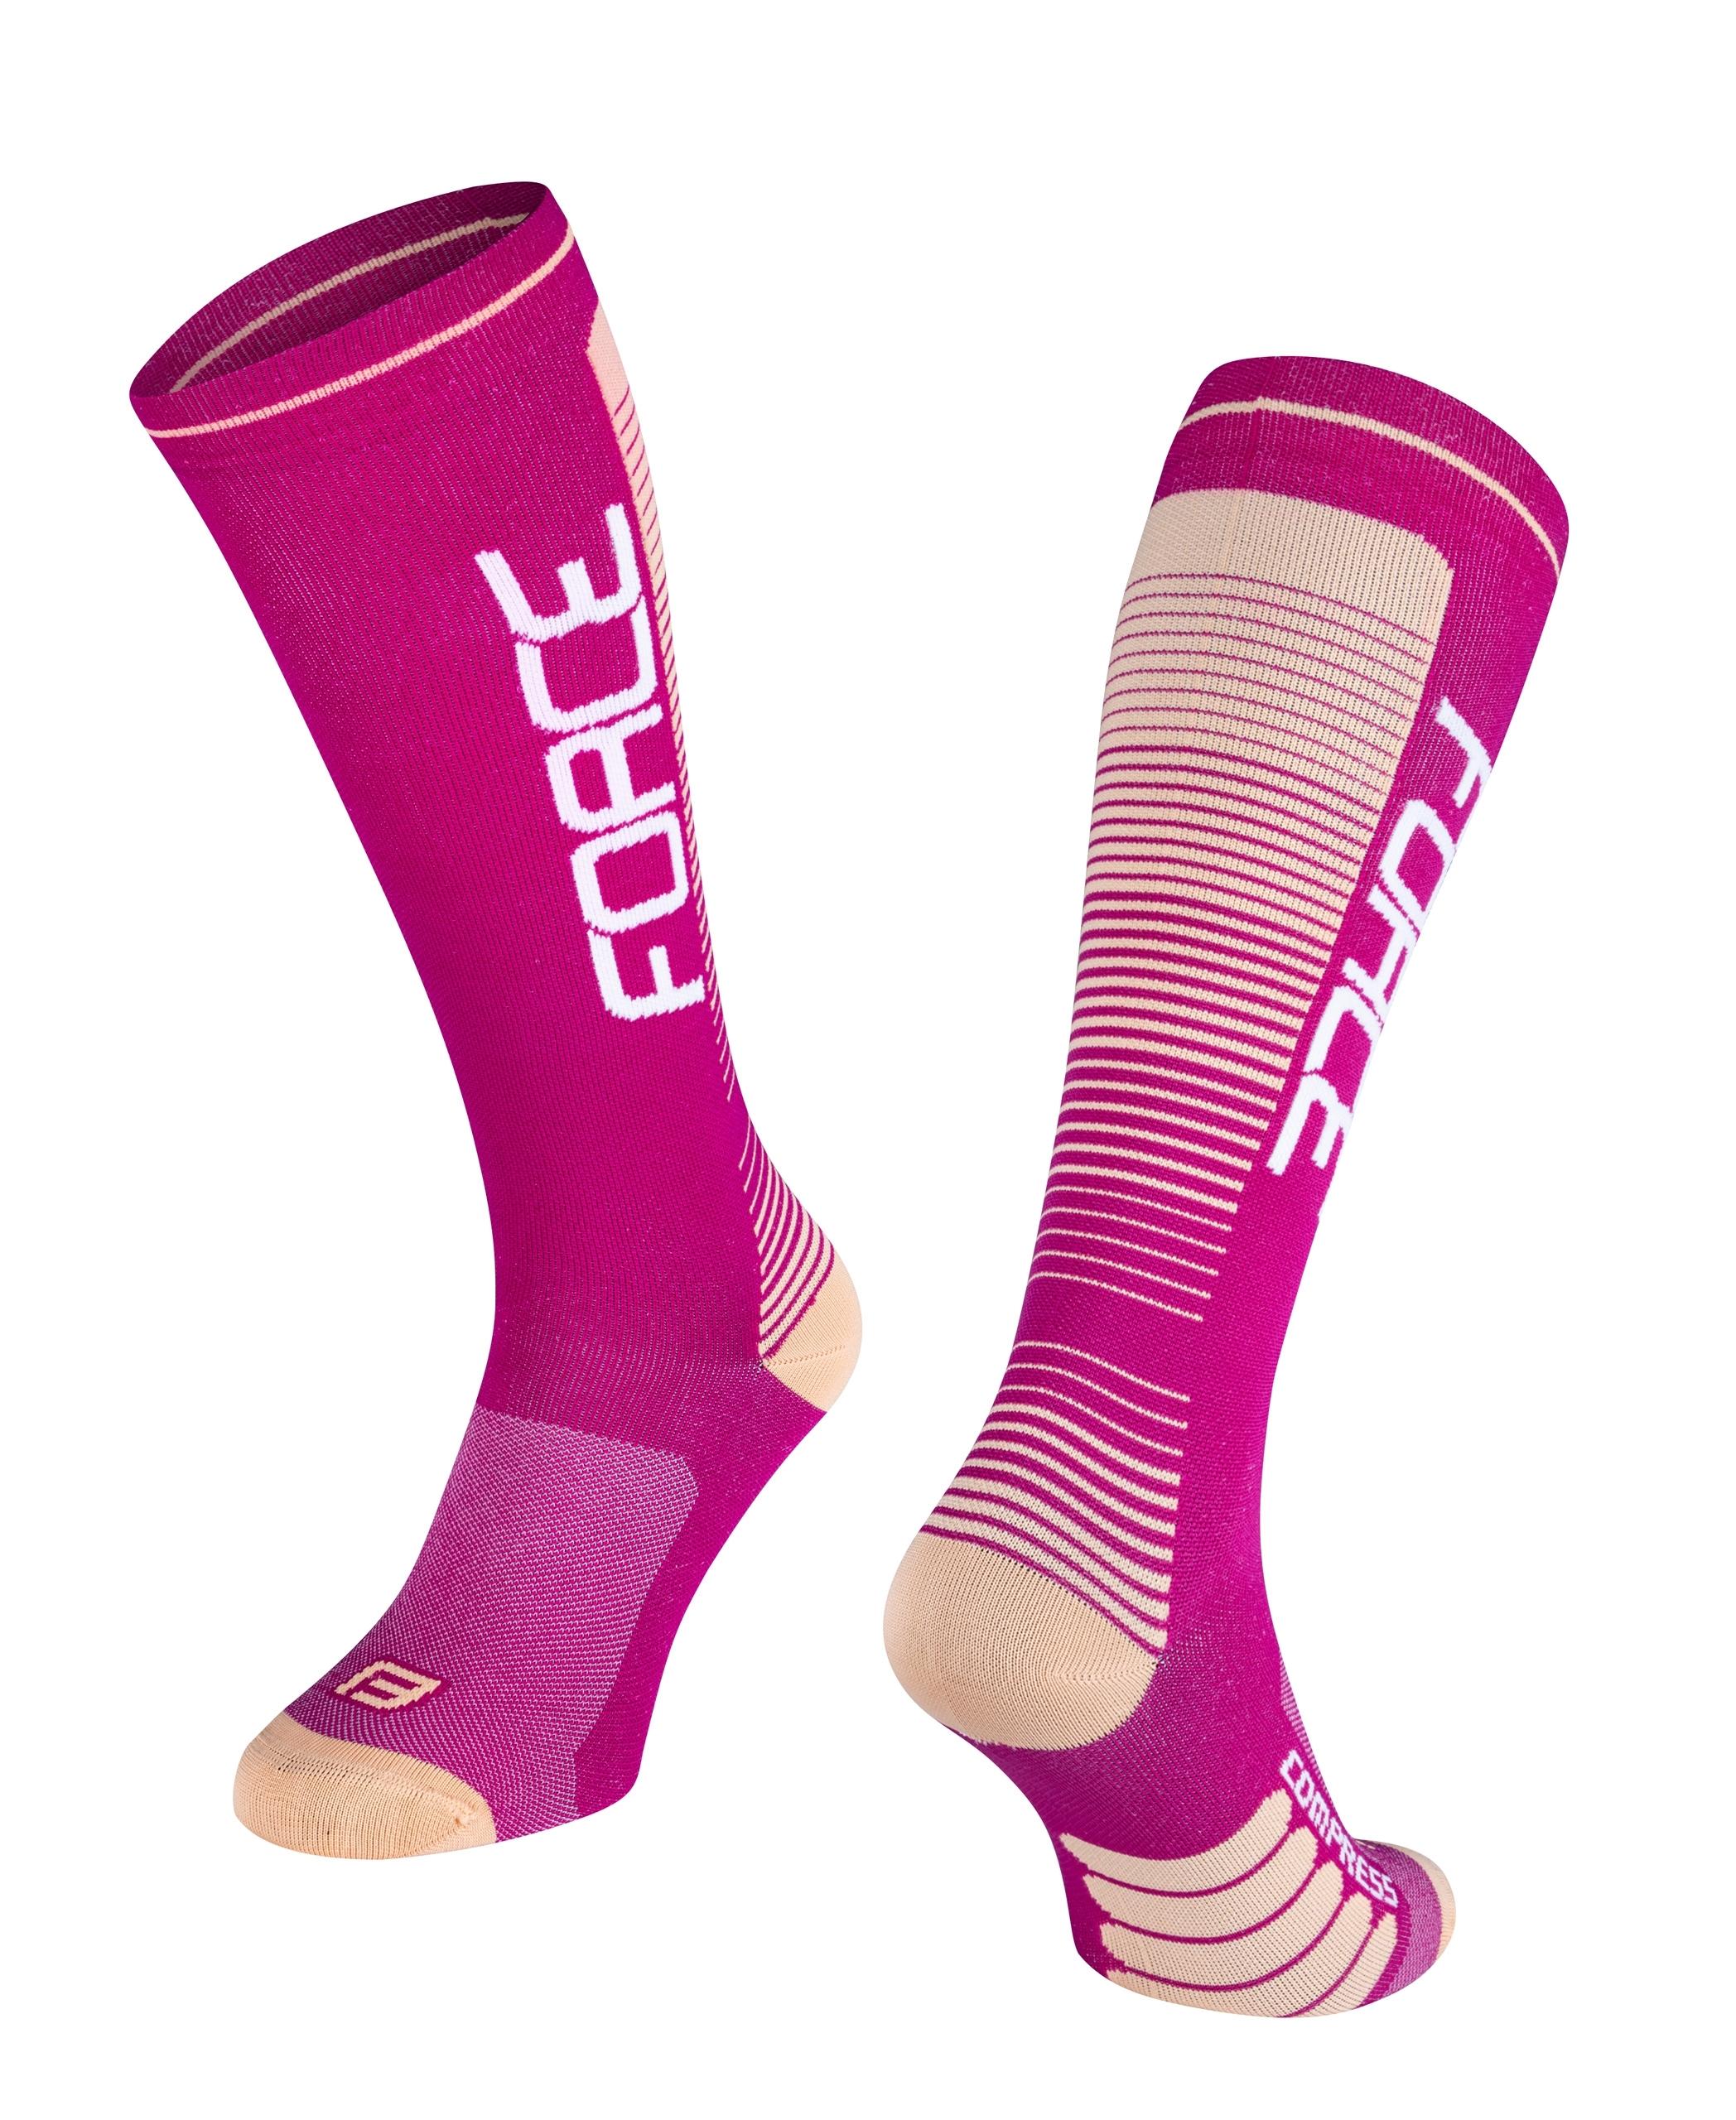 ponožky F COMPRESS, fialovo-meruňkové L-XL/42-47